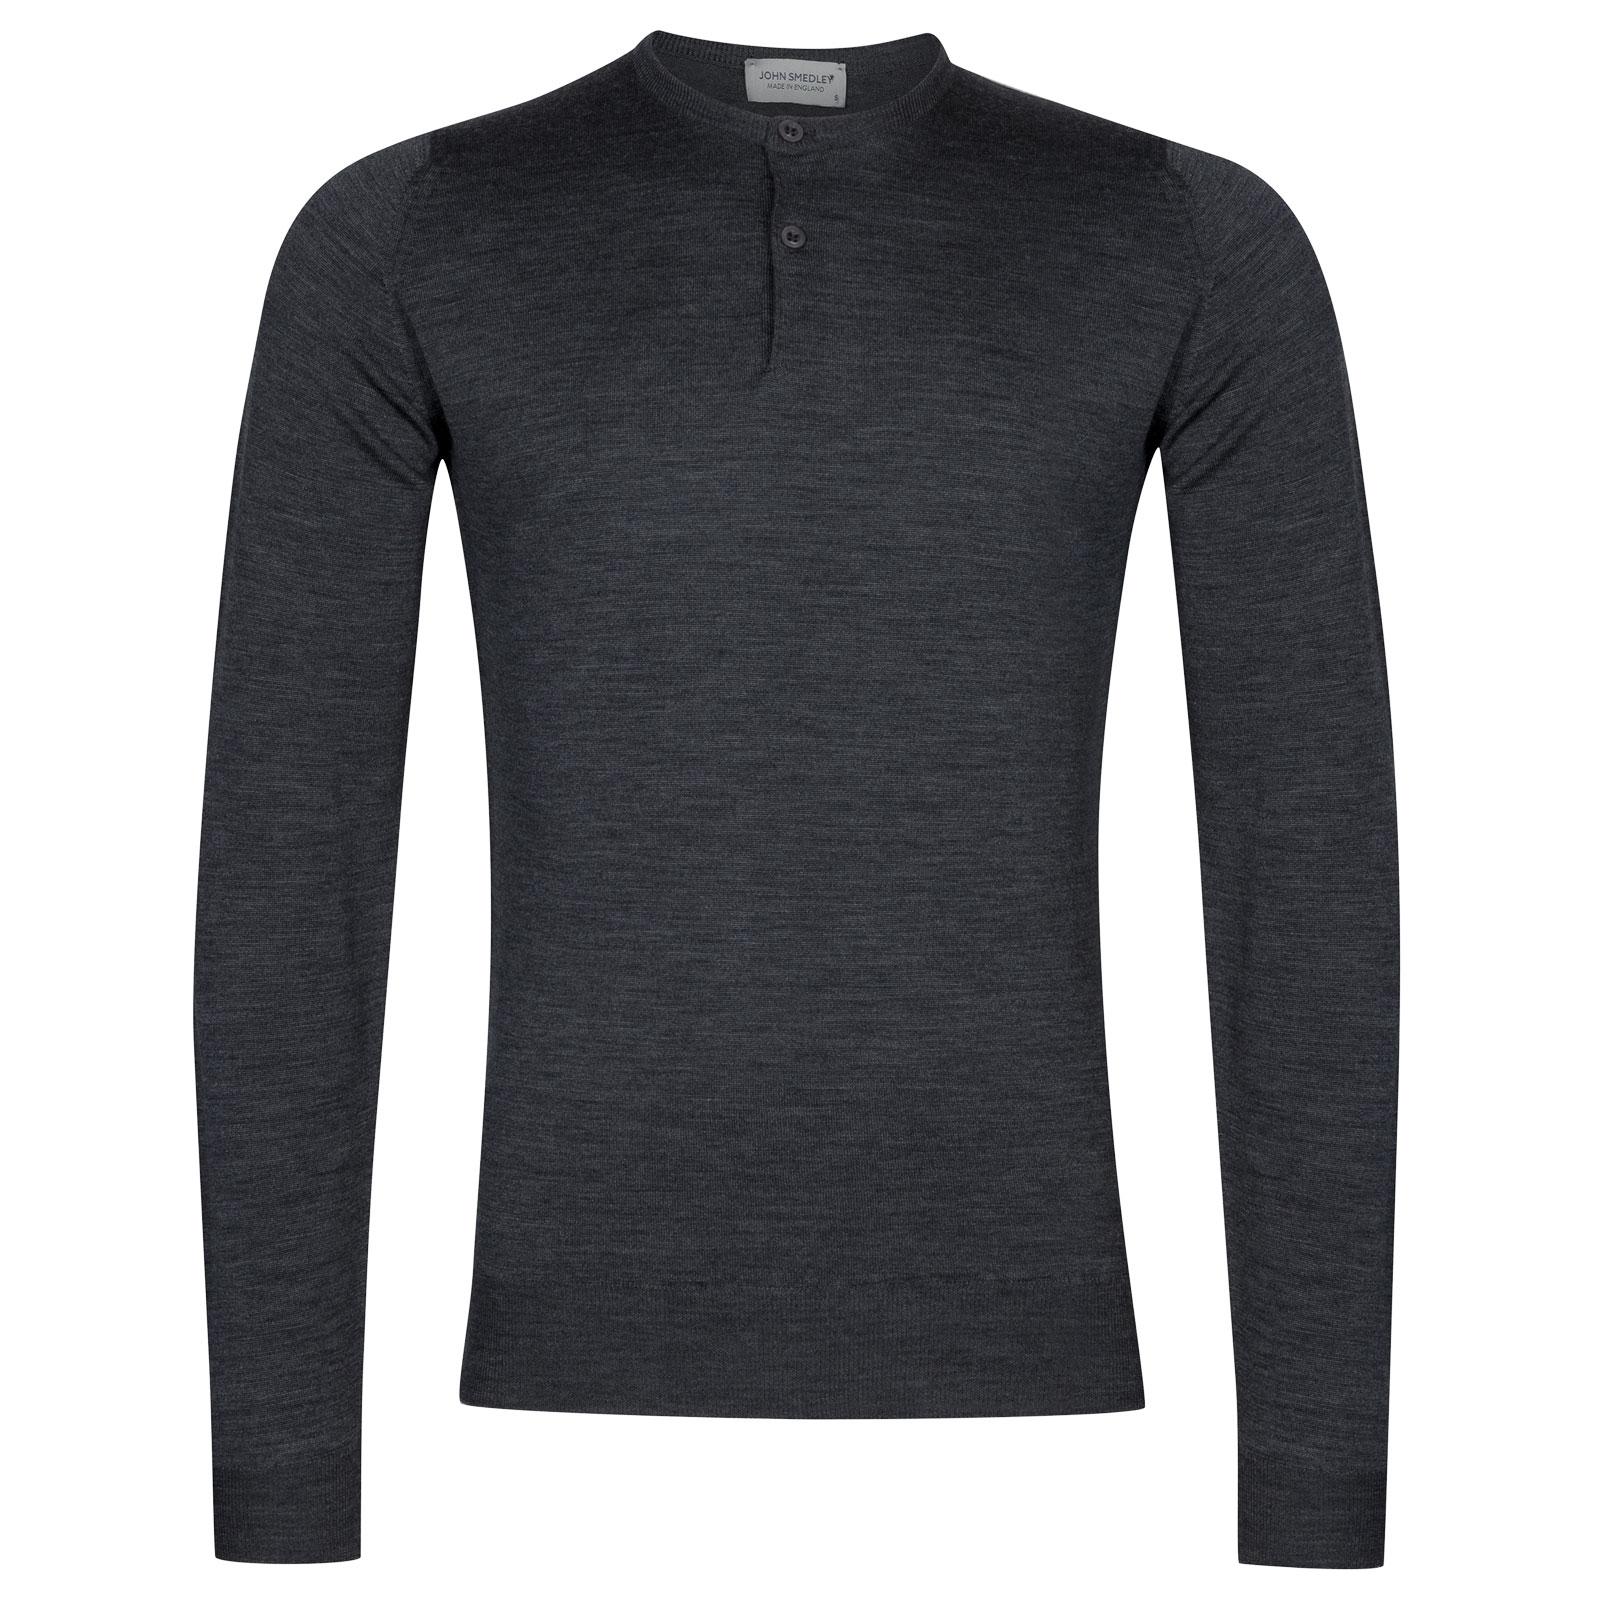 John Smedley russet Merino Wool Henley Shirt in Charcoal-S